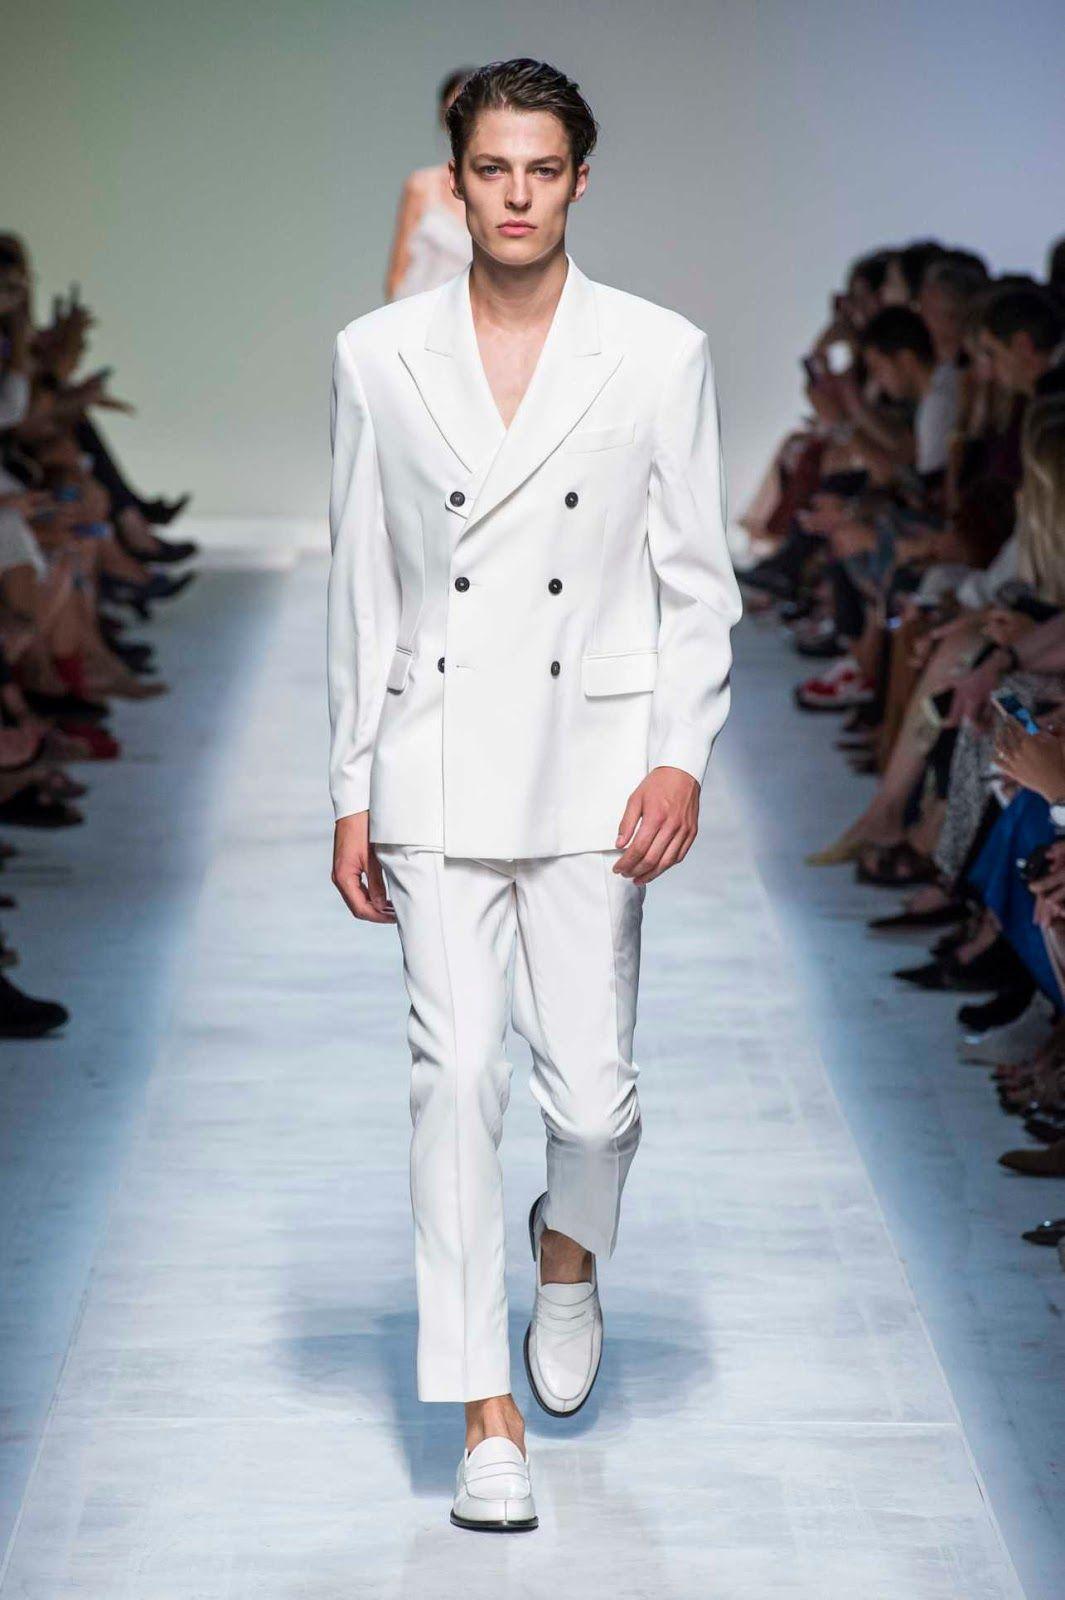 4da95628aca Male Fashion Trends  Ermanno Scervino Spring-Summer 2019 Runway Show